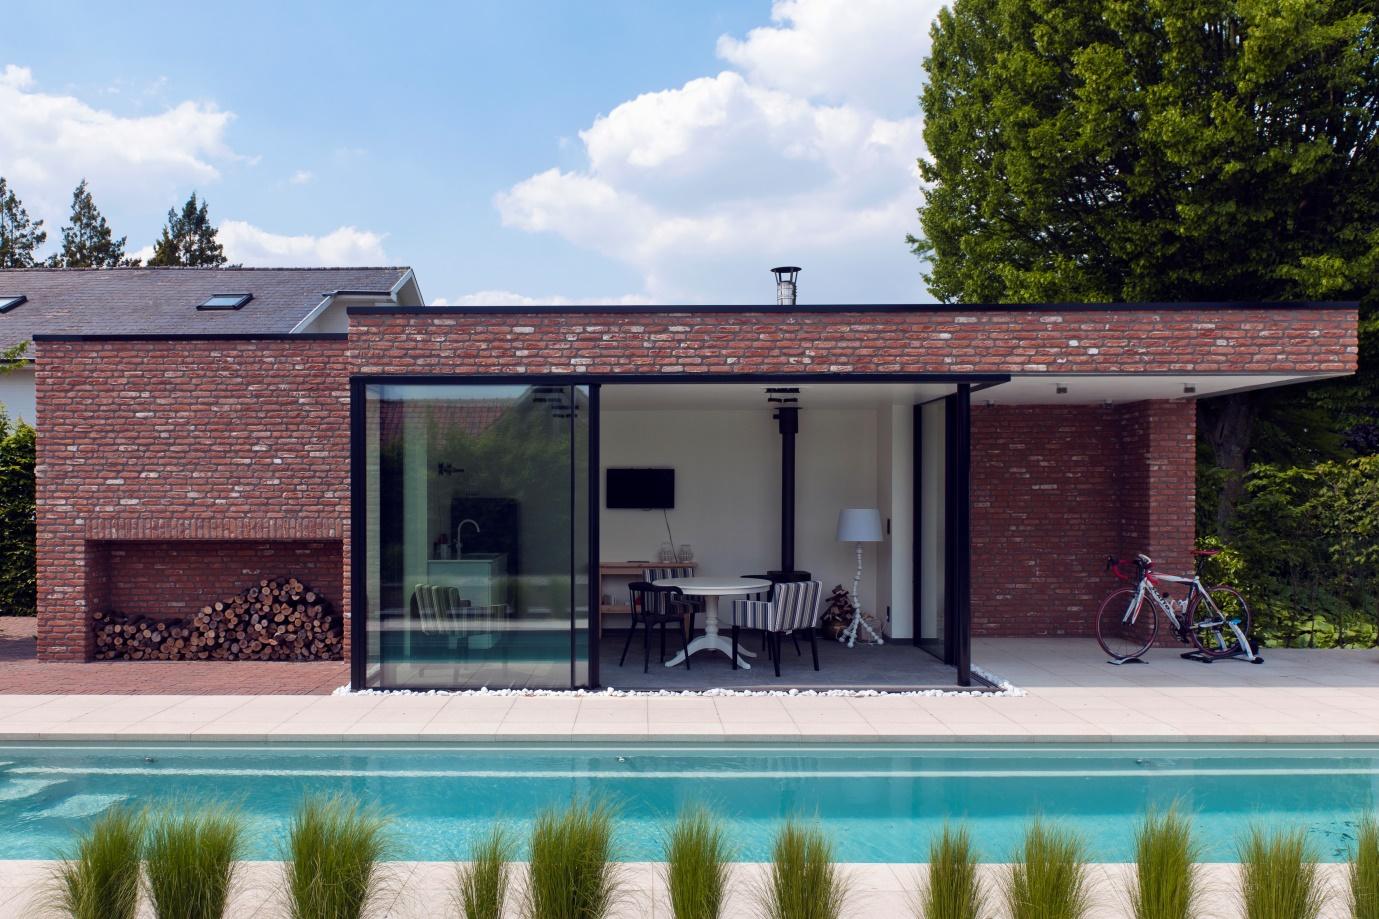 minimal windows to external pool house,